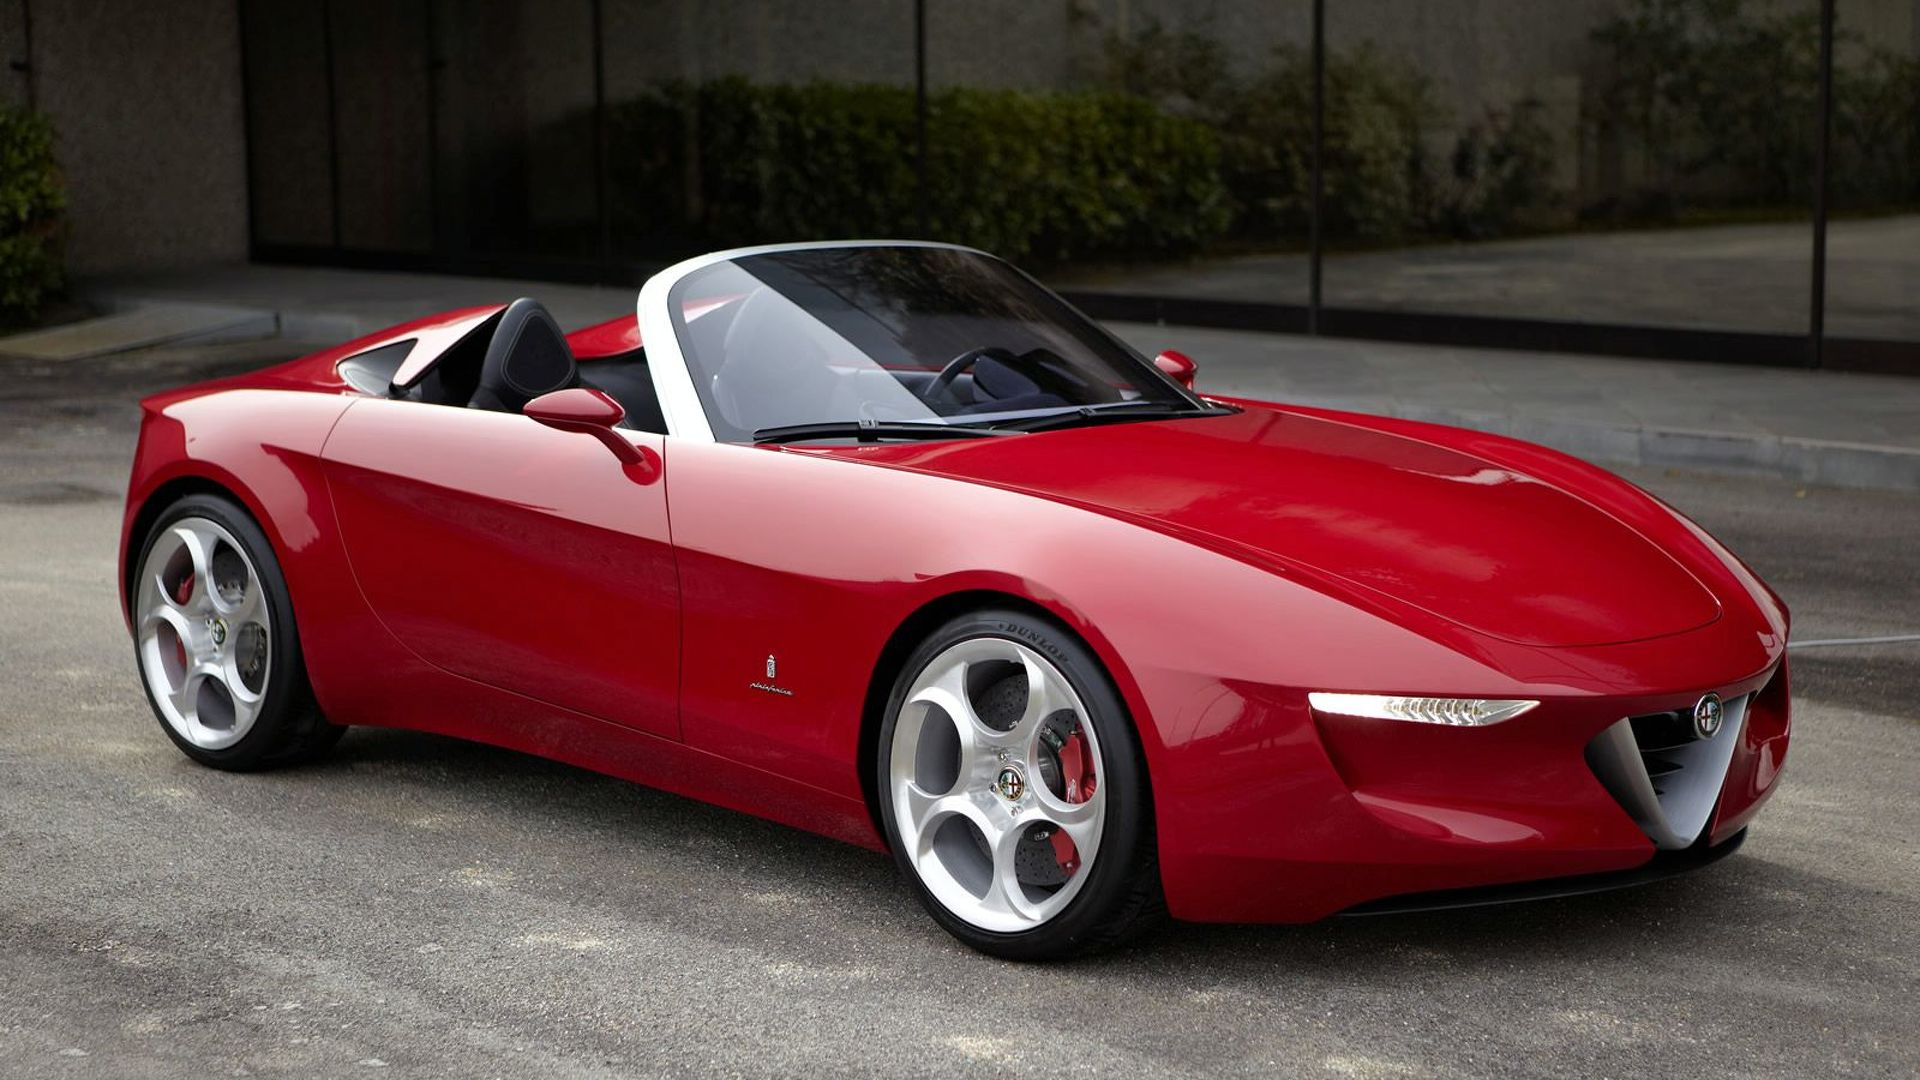 Alfa Romeo plotting a new Spider, won't be Mazda-based - report